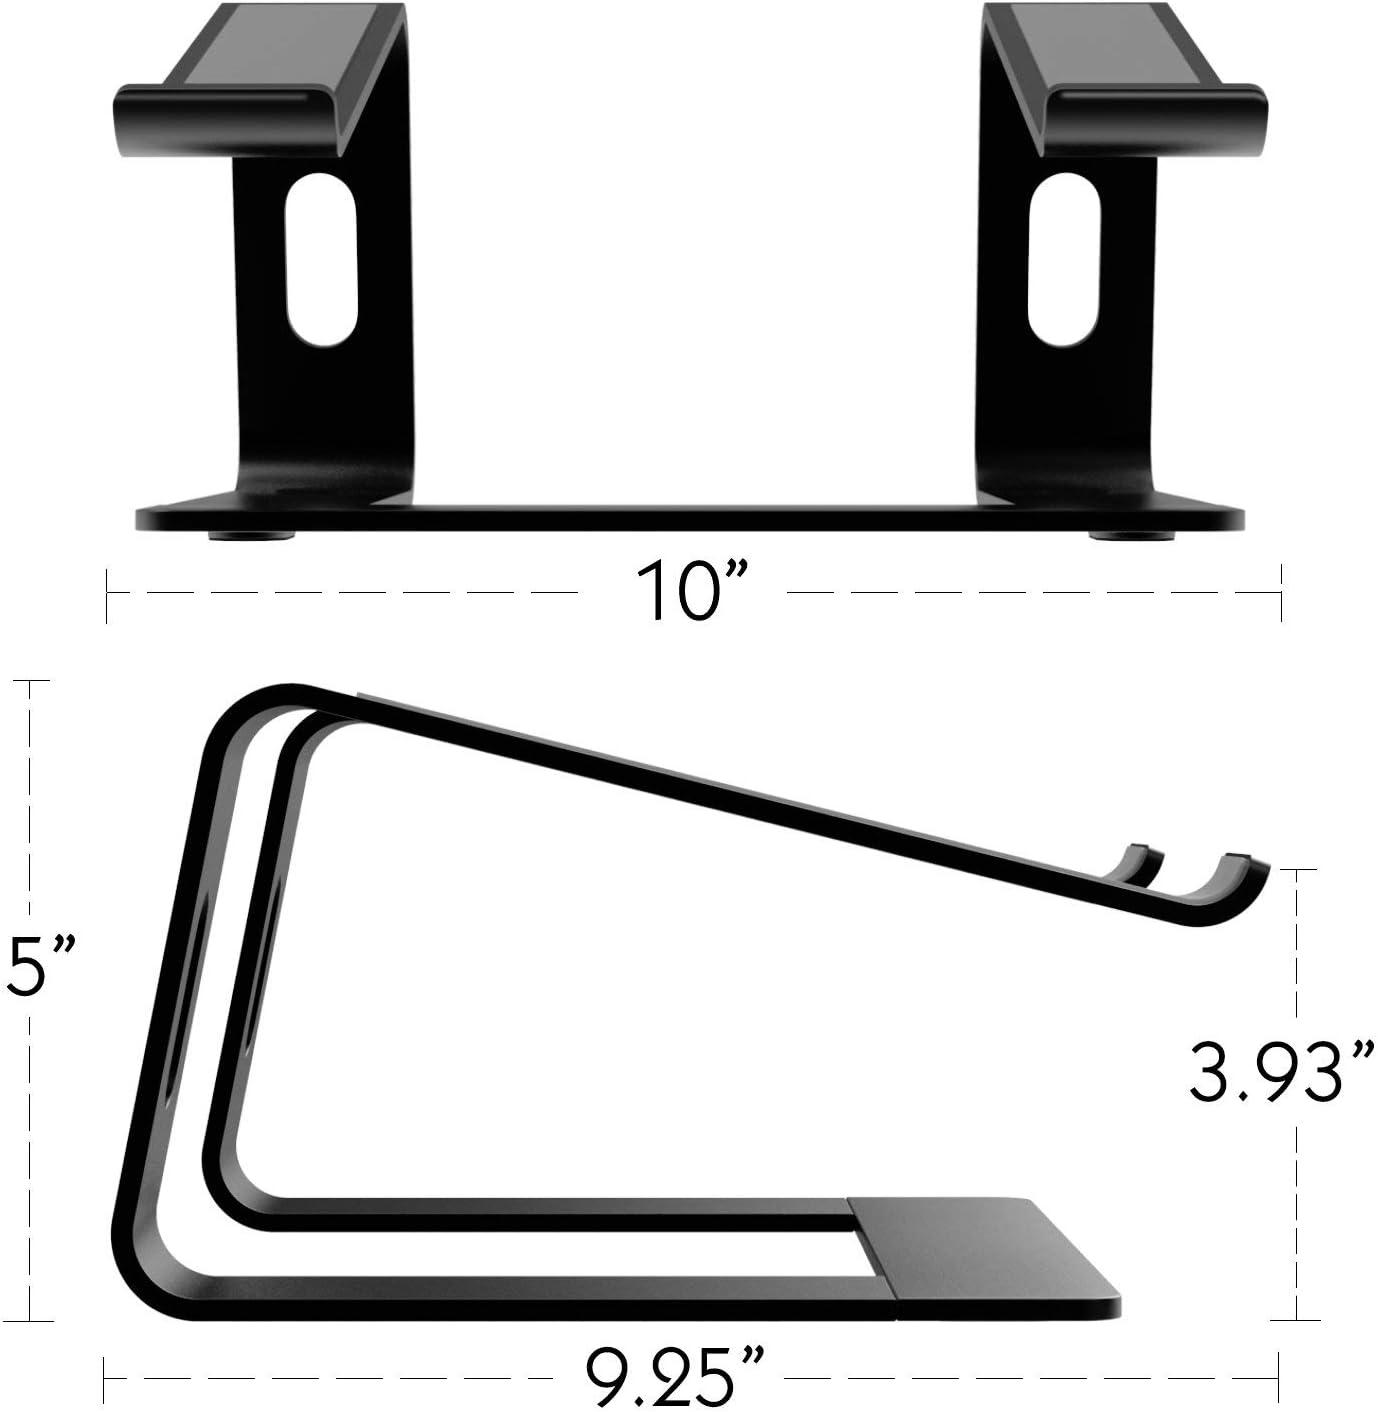 Alician CE Laptop Riser Stand Universal Detachable Portable Aluminum Alloy Notebook PC Desk Holder Black